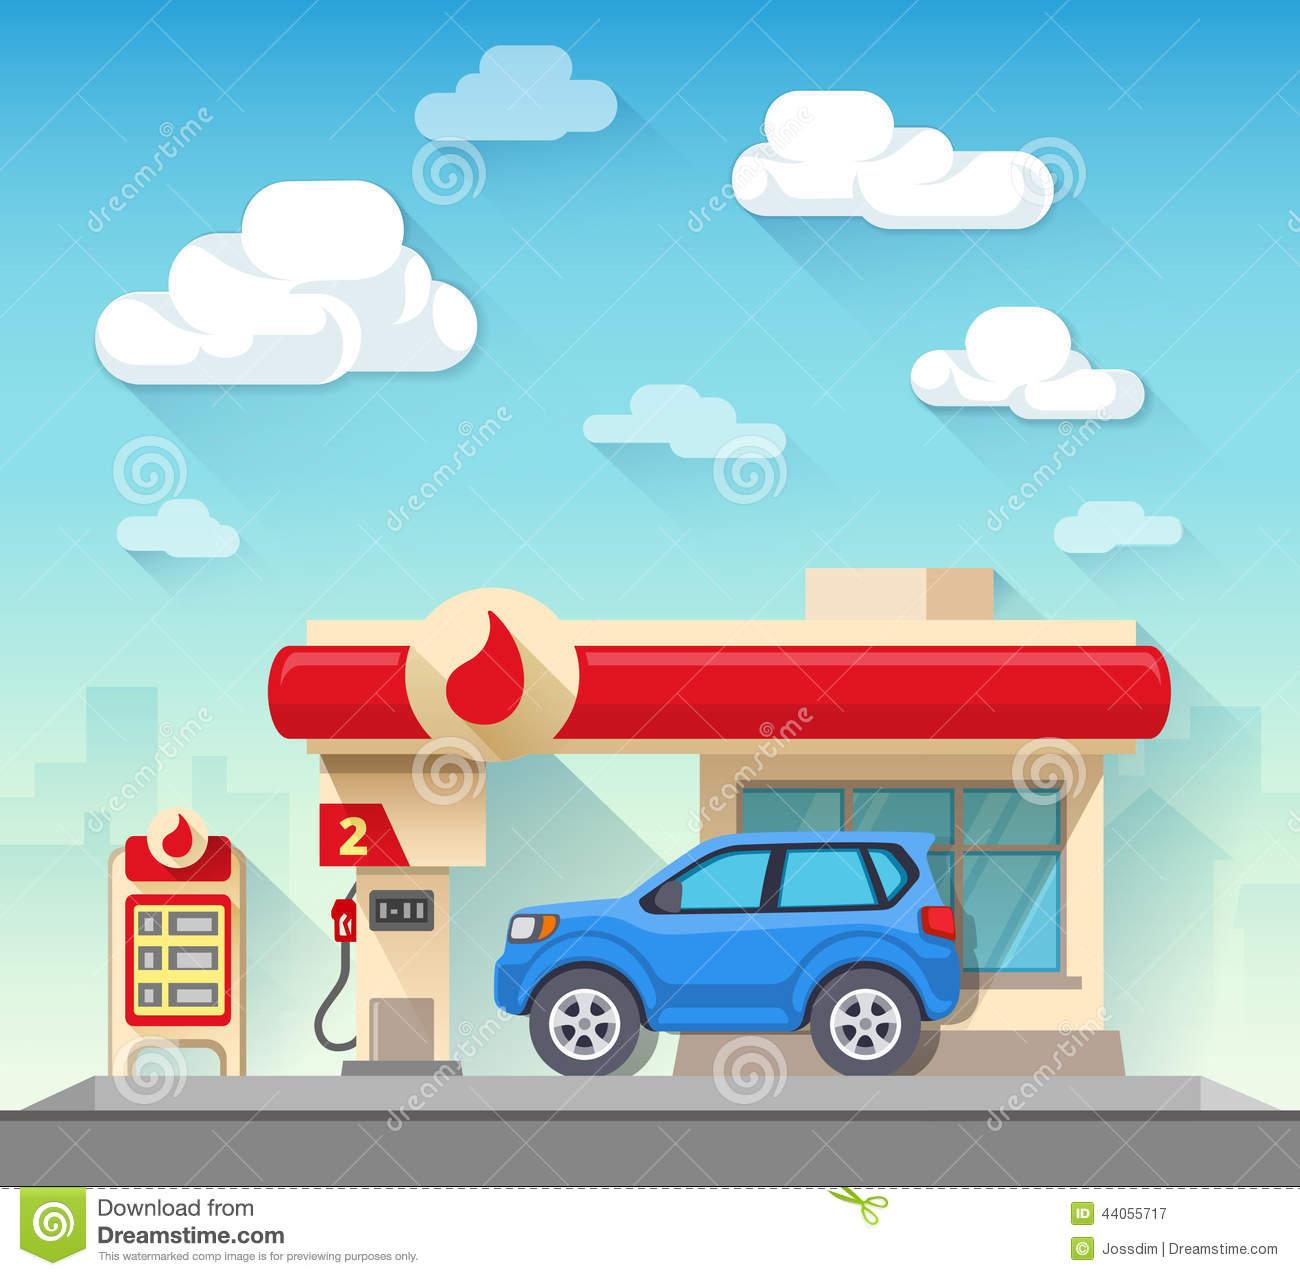 Free clipart of car at gas pump.